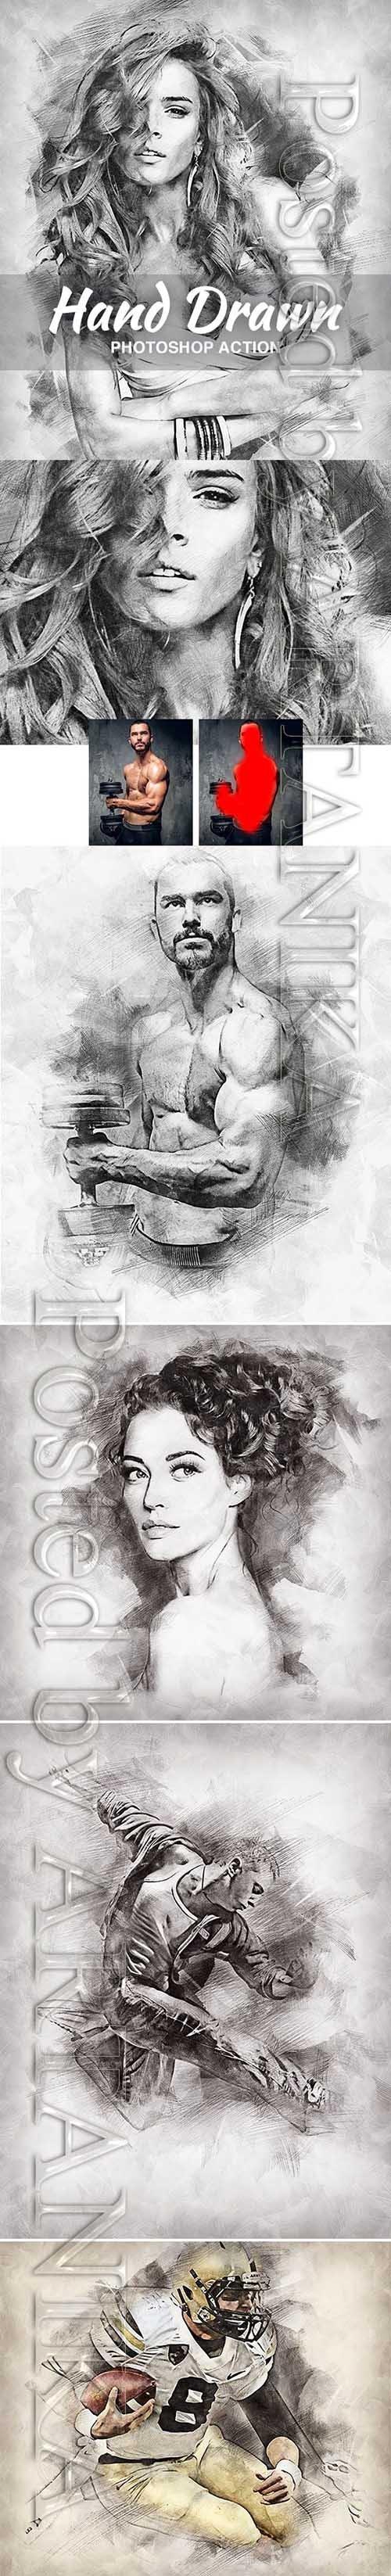 Hand Drawn Photoshop Action 21151344